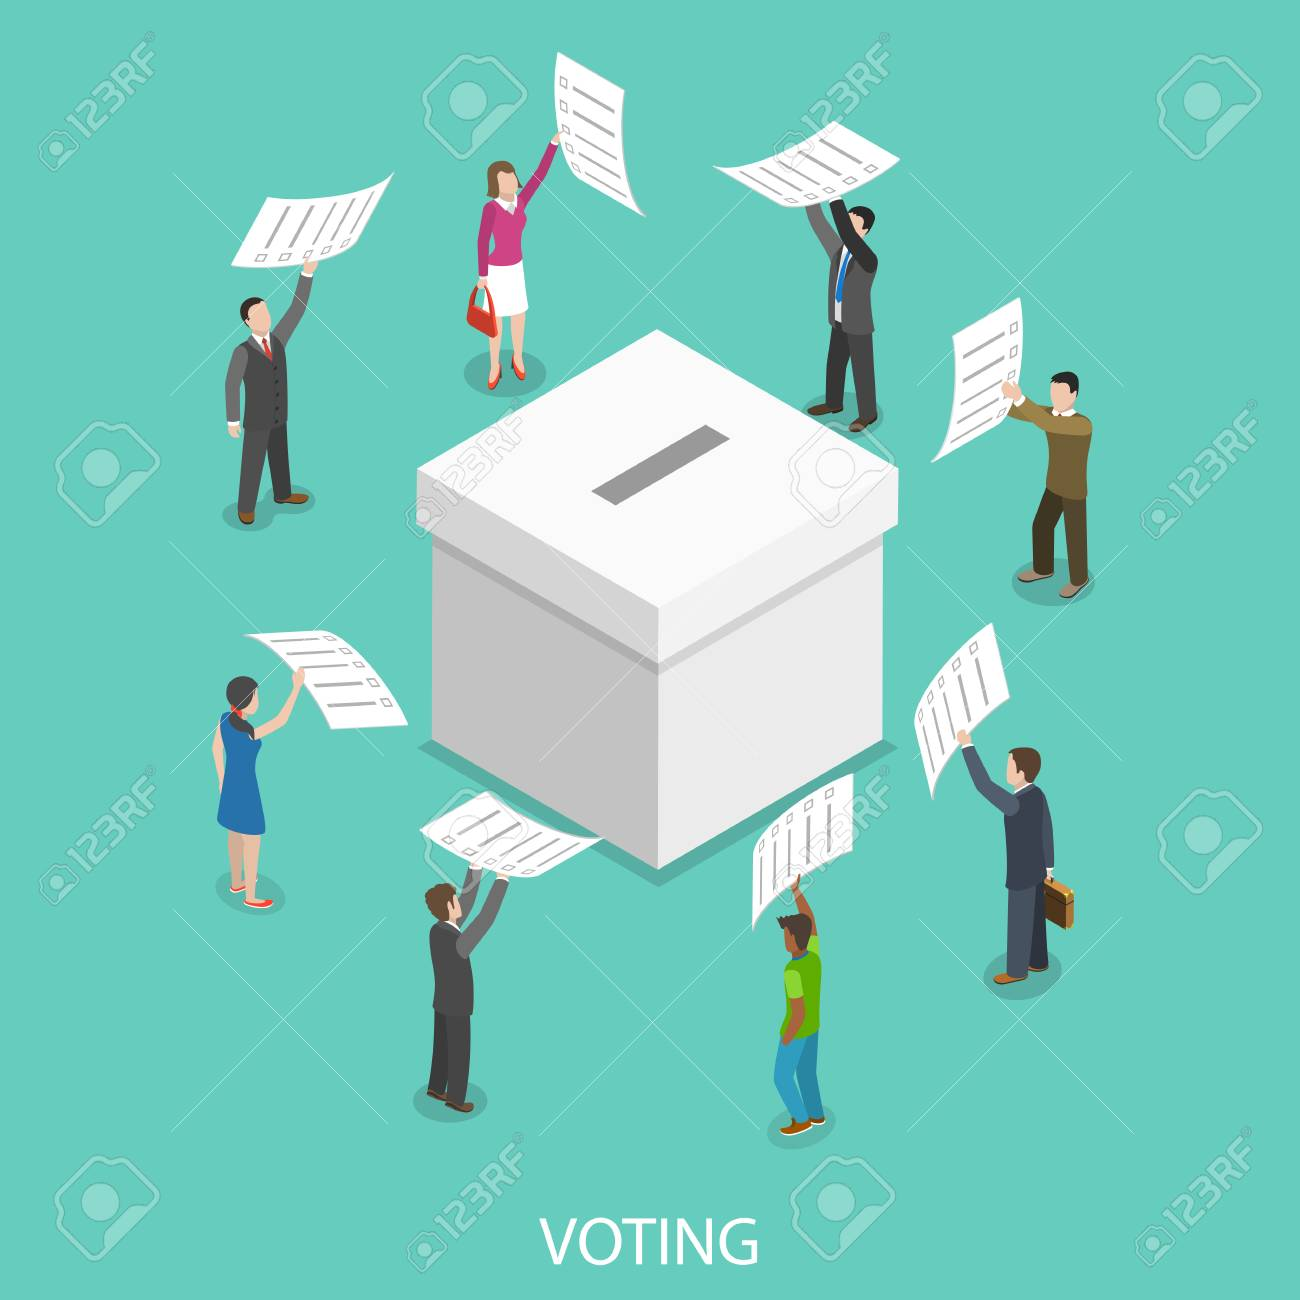 Voting flat isometric vector concept. - 93388808